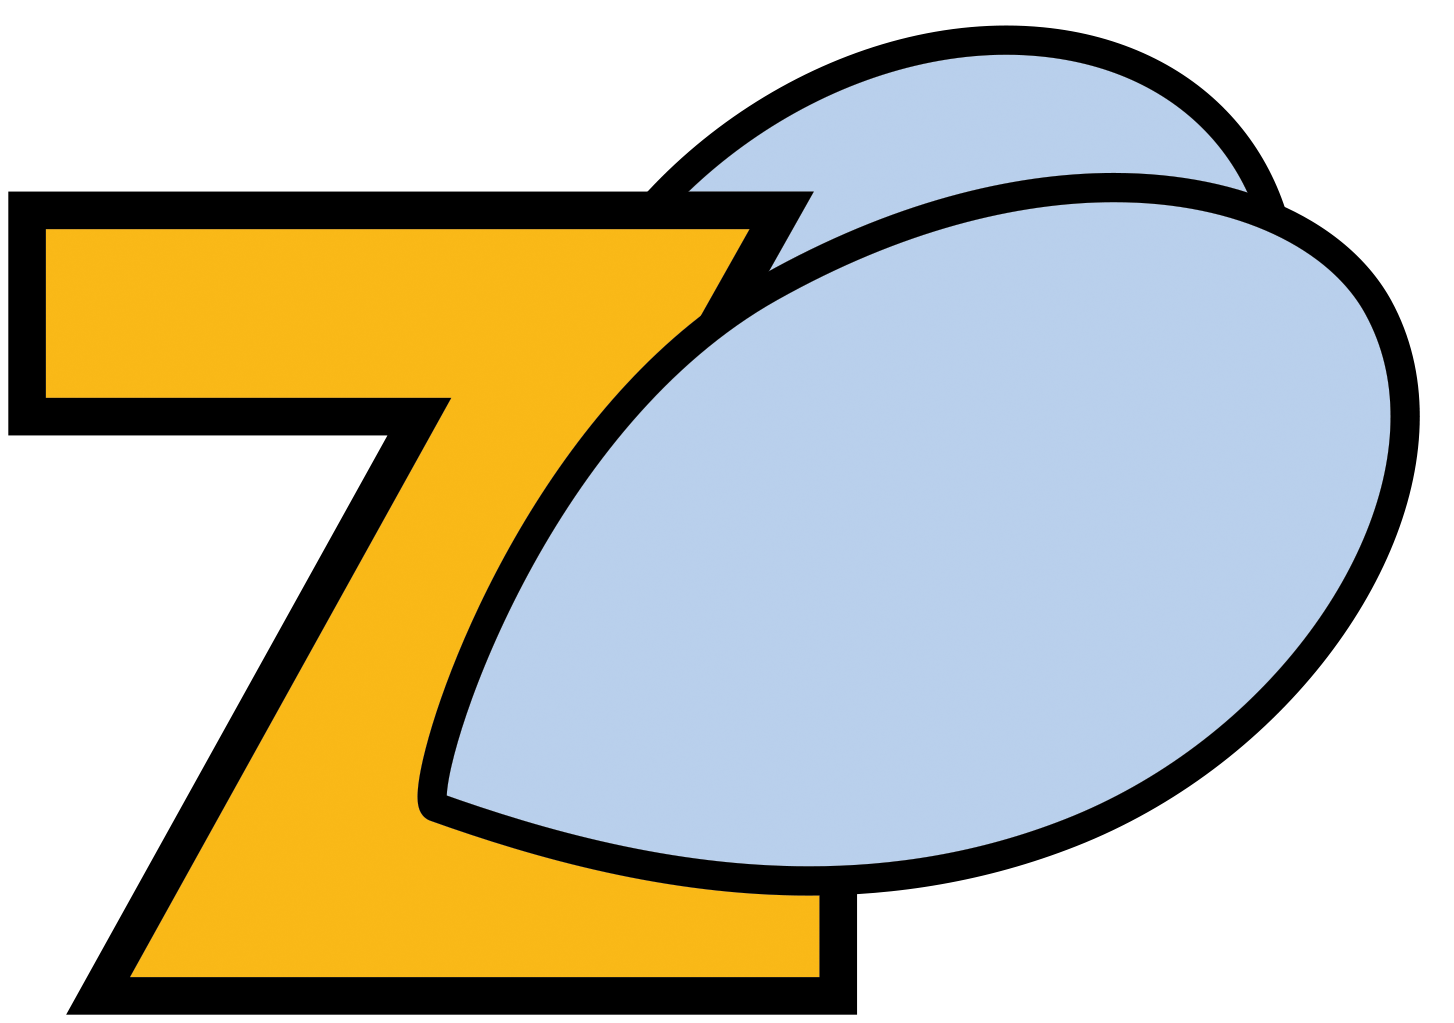 Zizbee Illustration